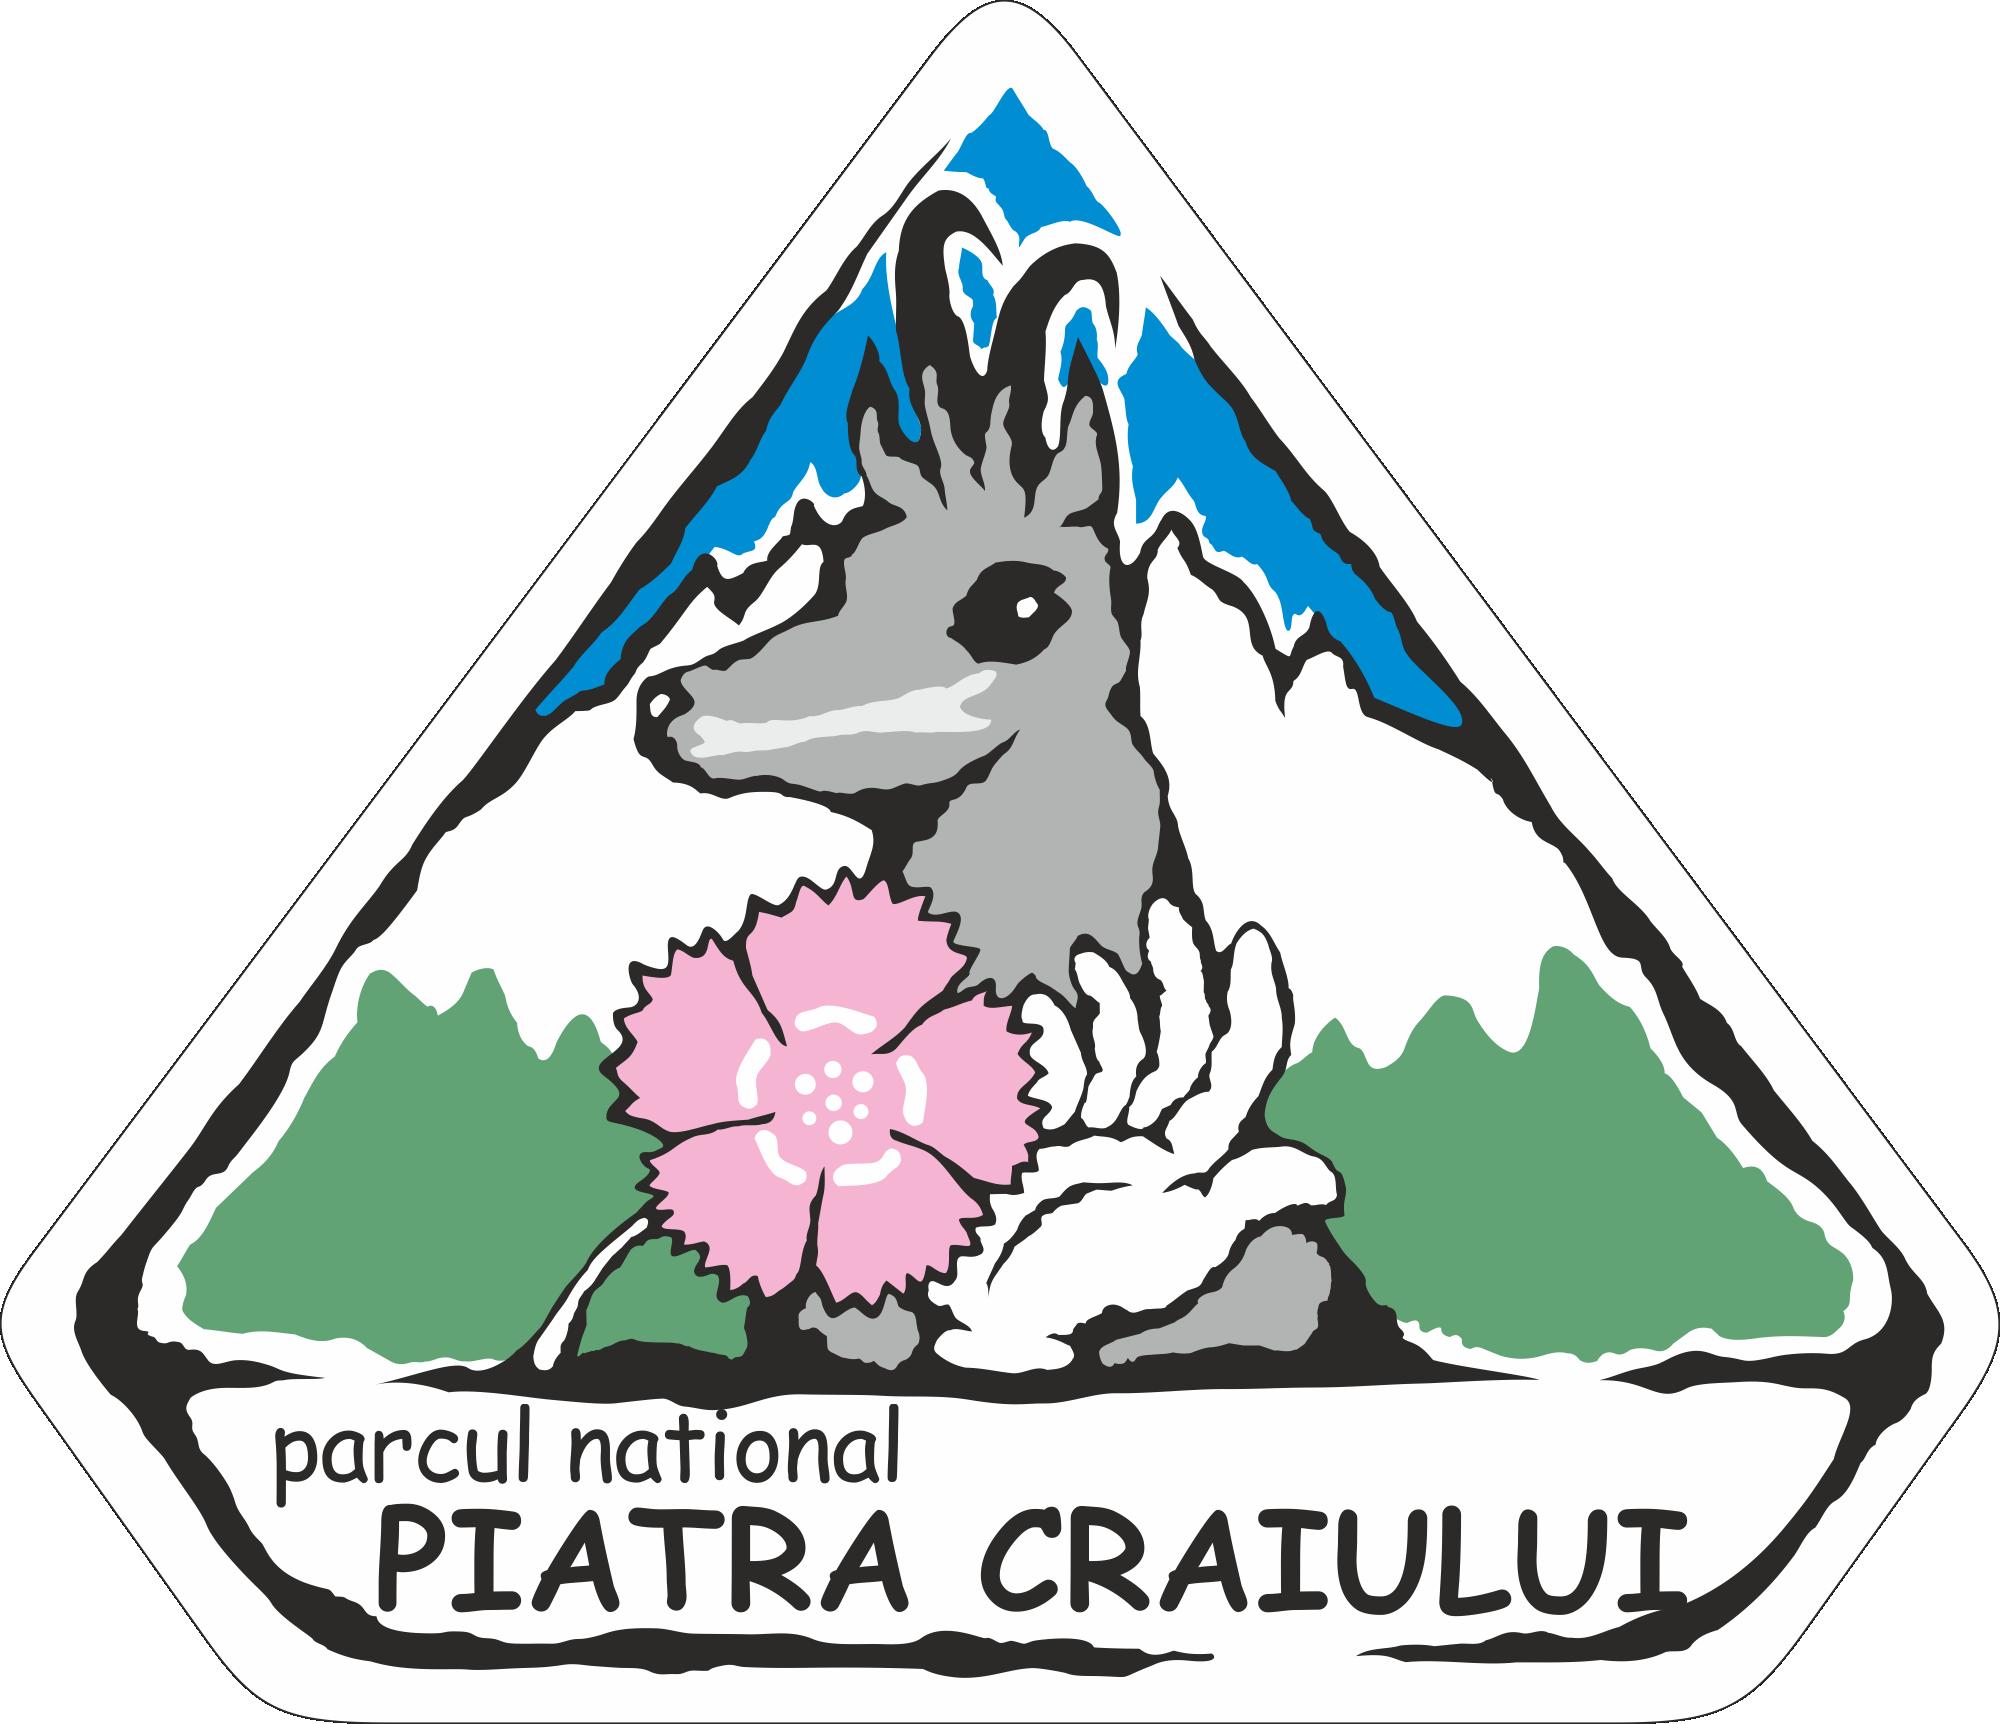 Parcul Natural Piatra Craiului